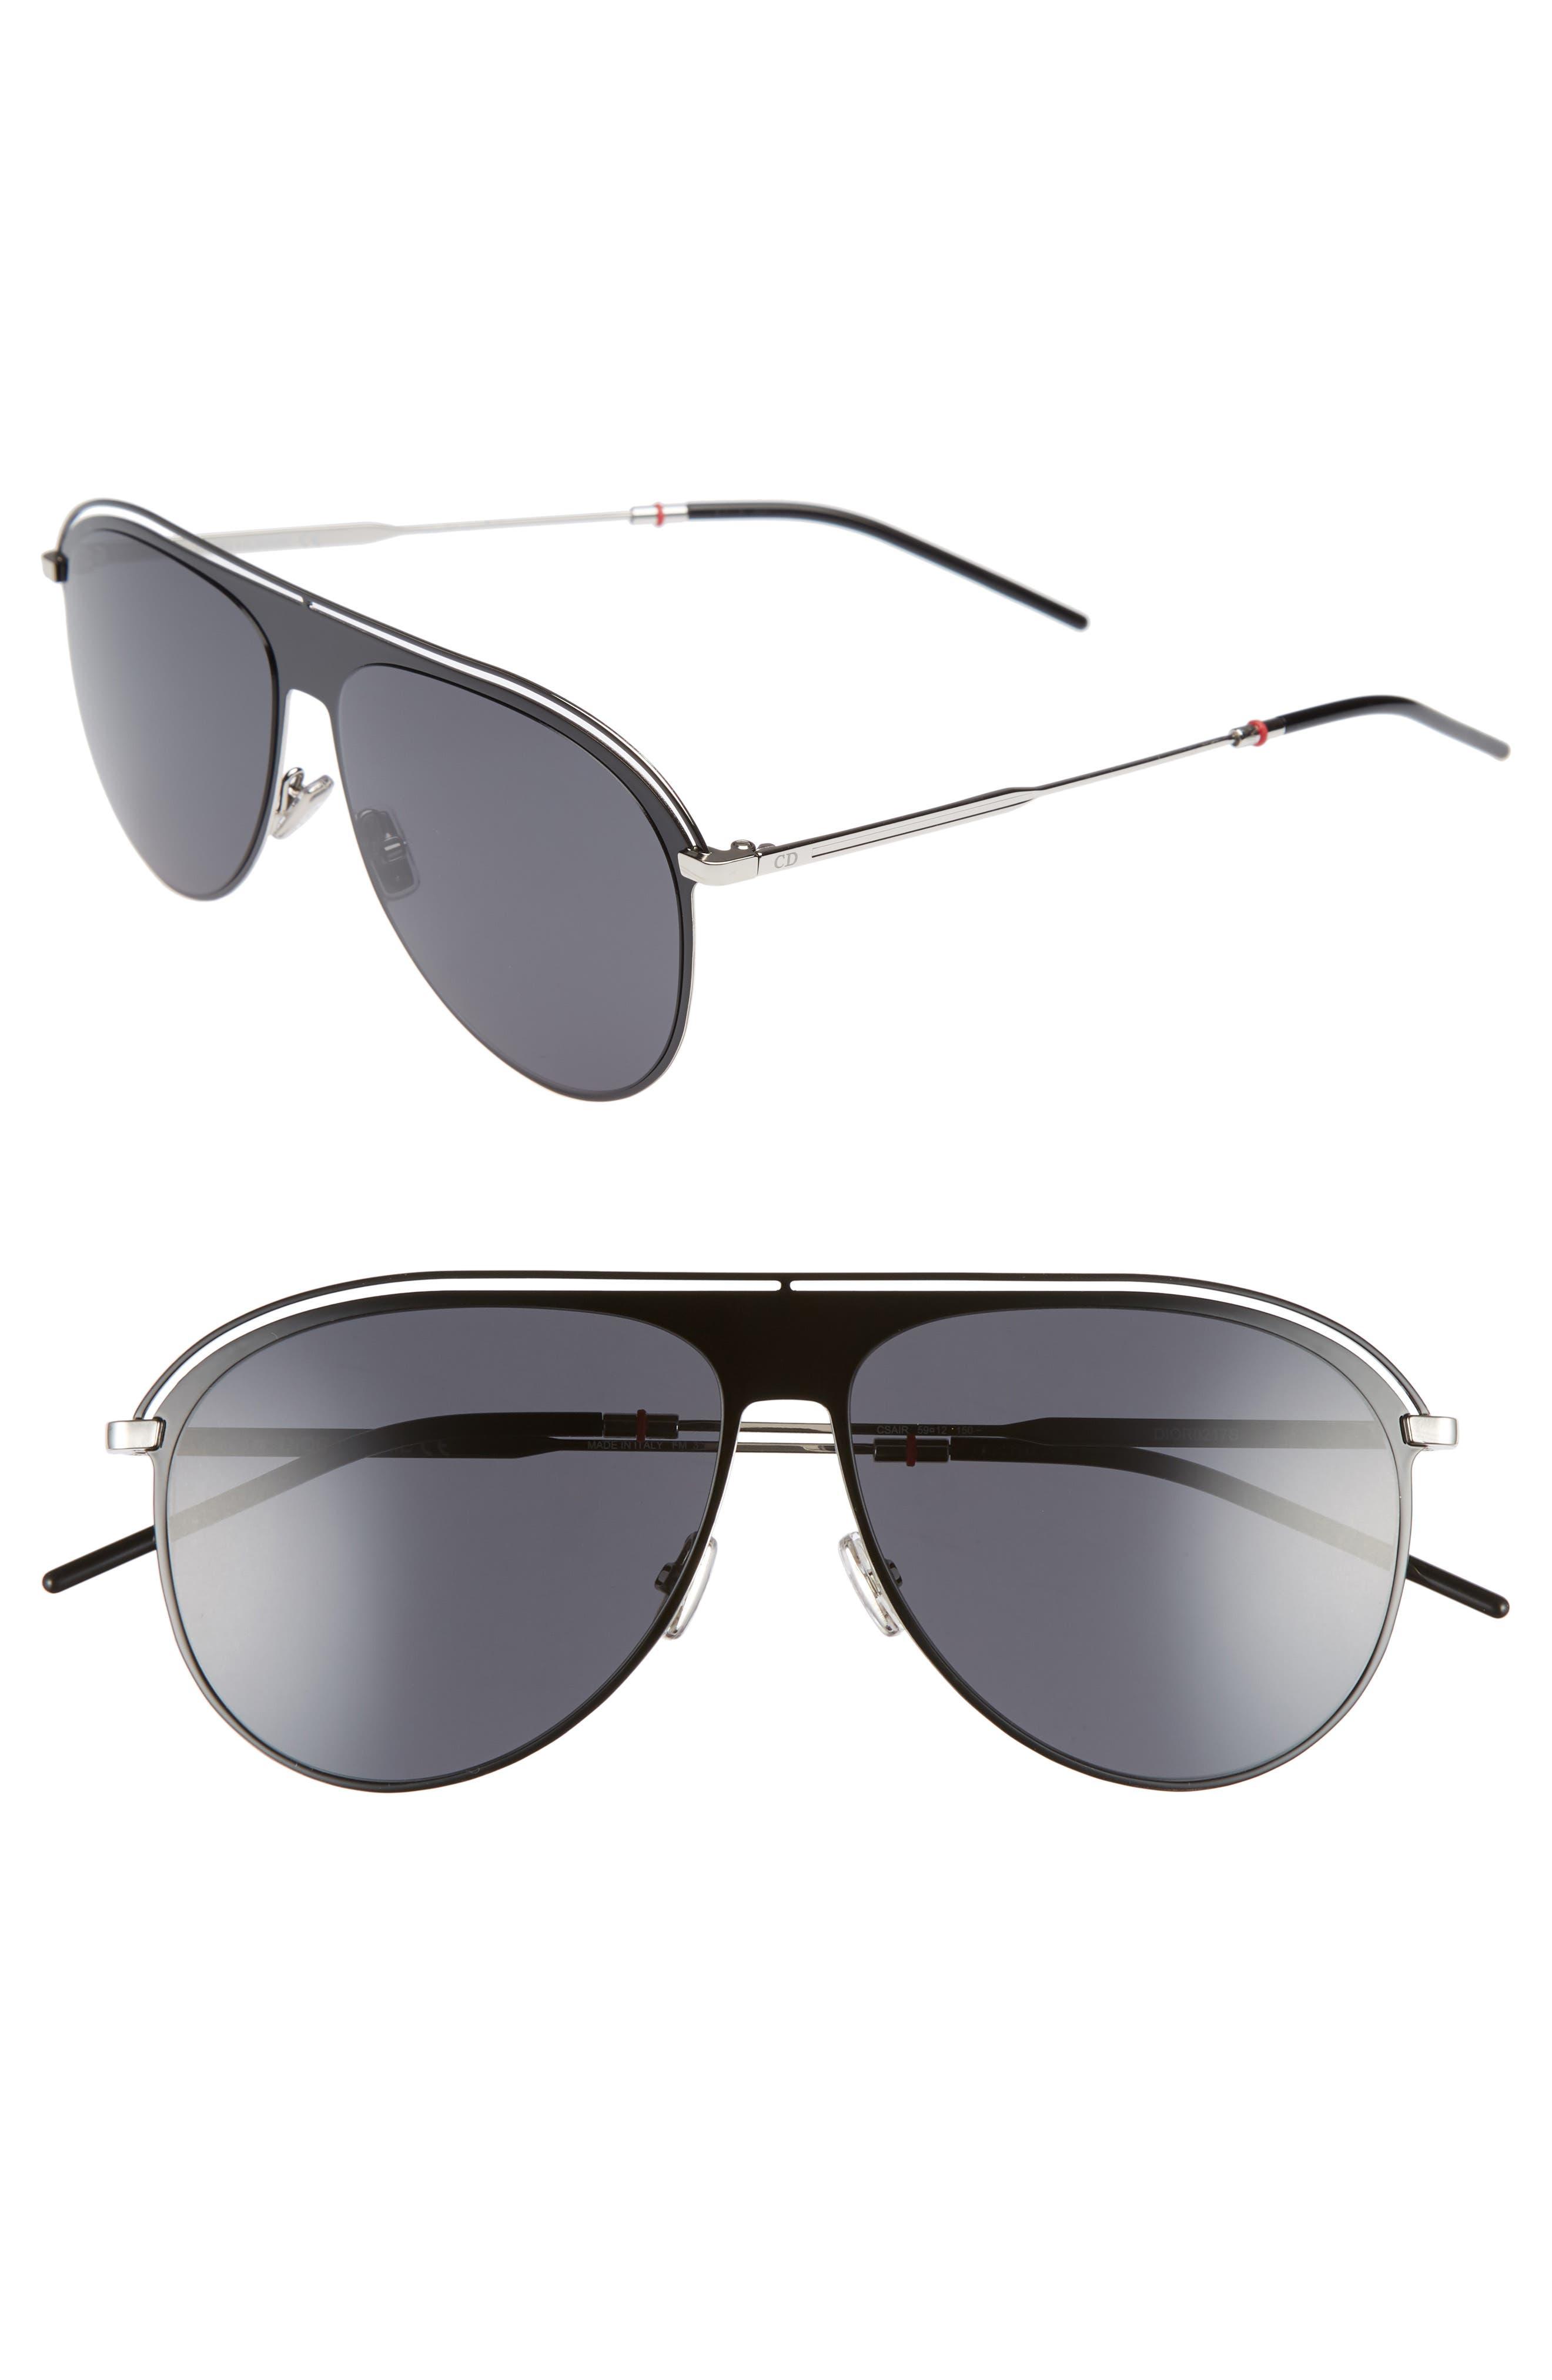 59mm Polarized Aviator Sunglasses,                         Main,                         color, BLACK PALLADIUM